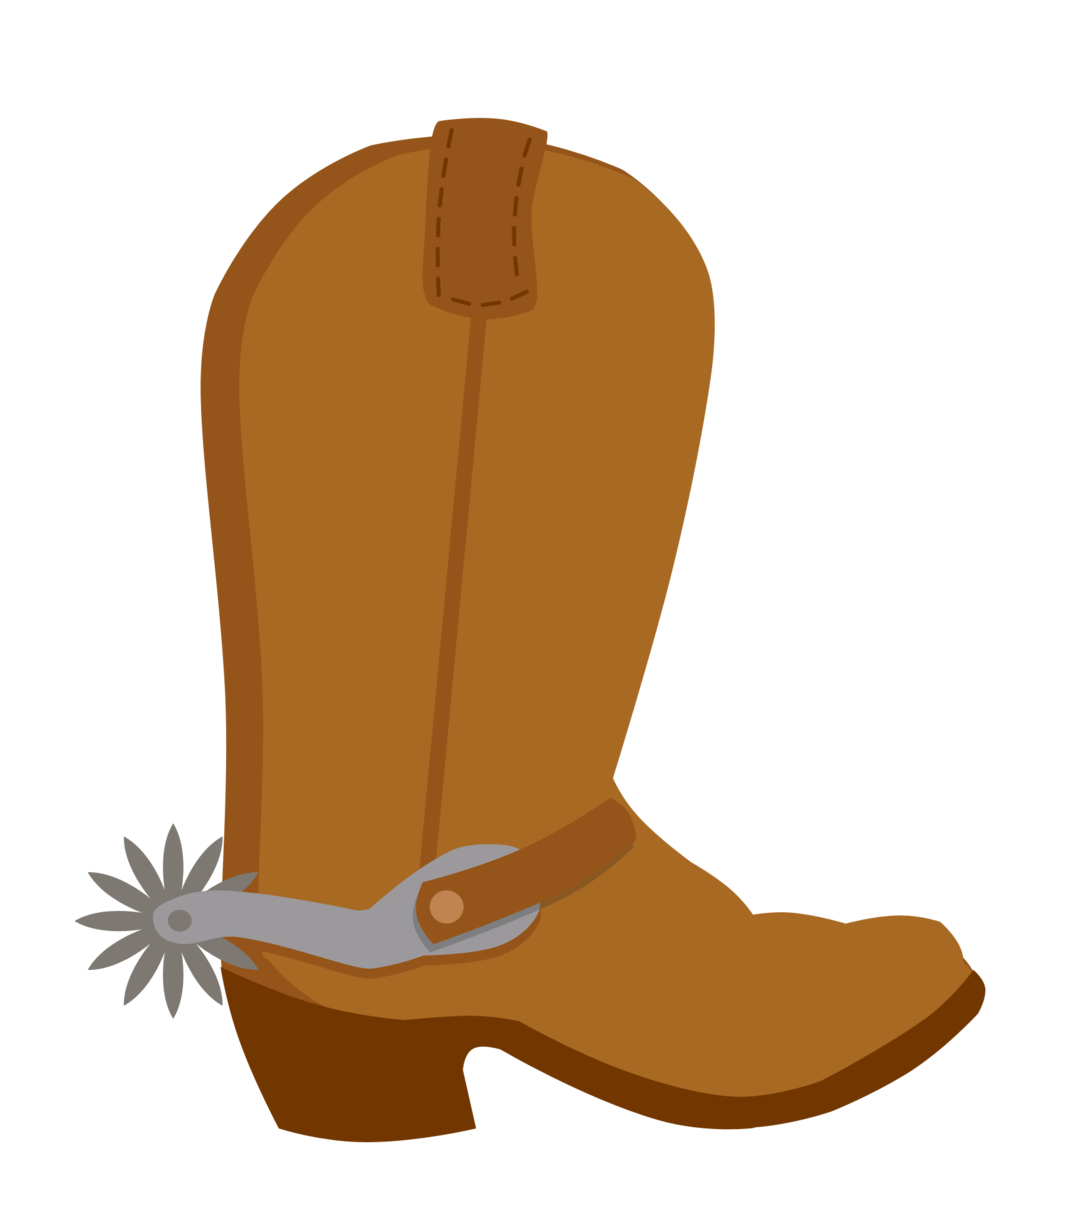 Cowboy Boot Images.